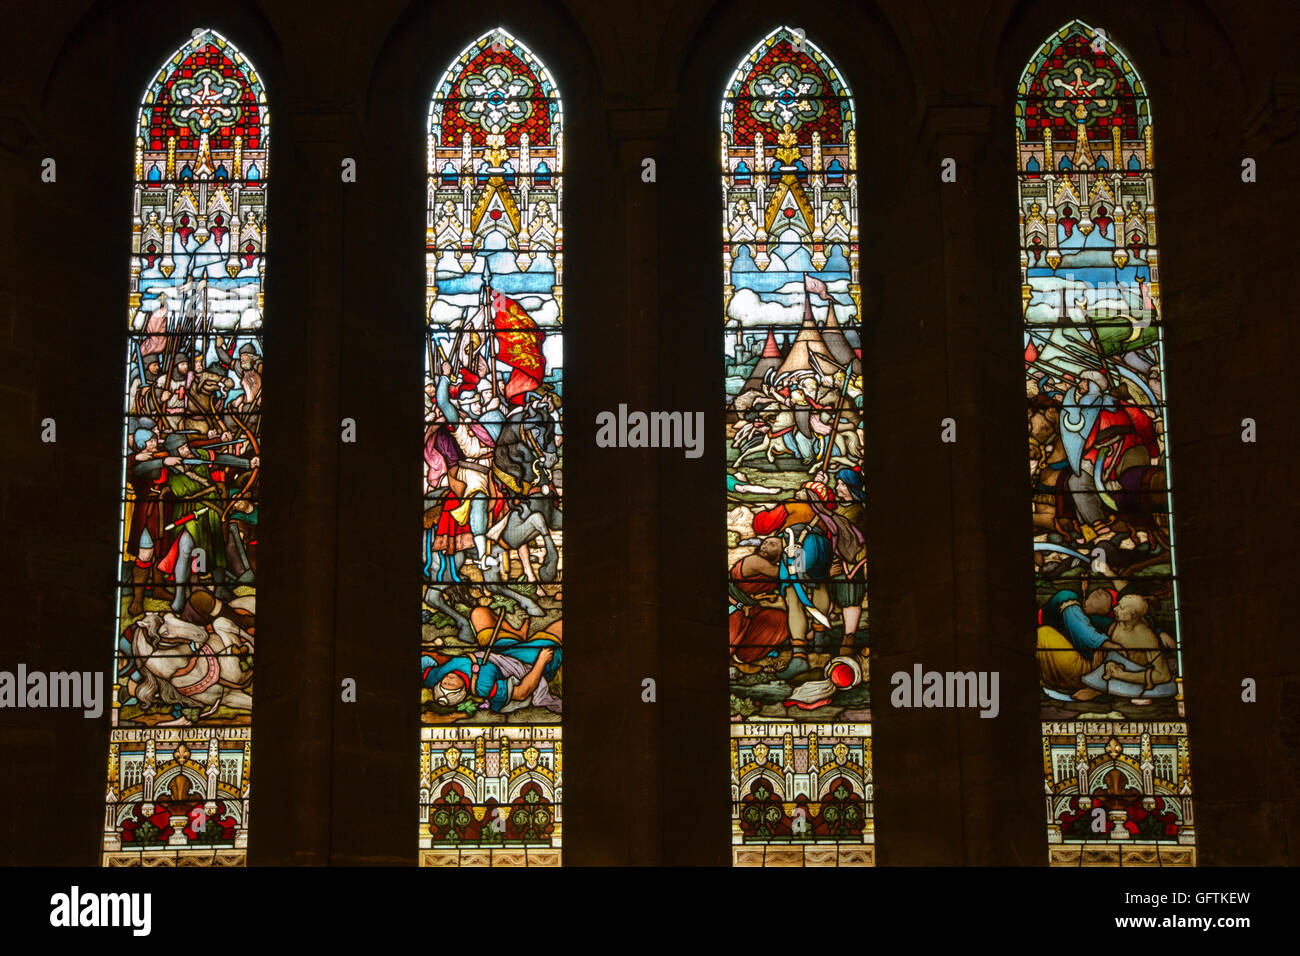 UK, England, Northamptonshire, Northampton, Church of Holy Sepulchre, Battle of Jaffa crusader stained glass windows - Stock Image